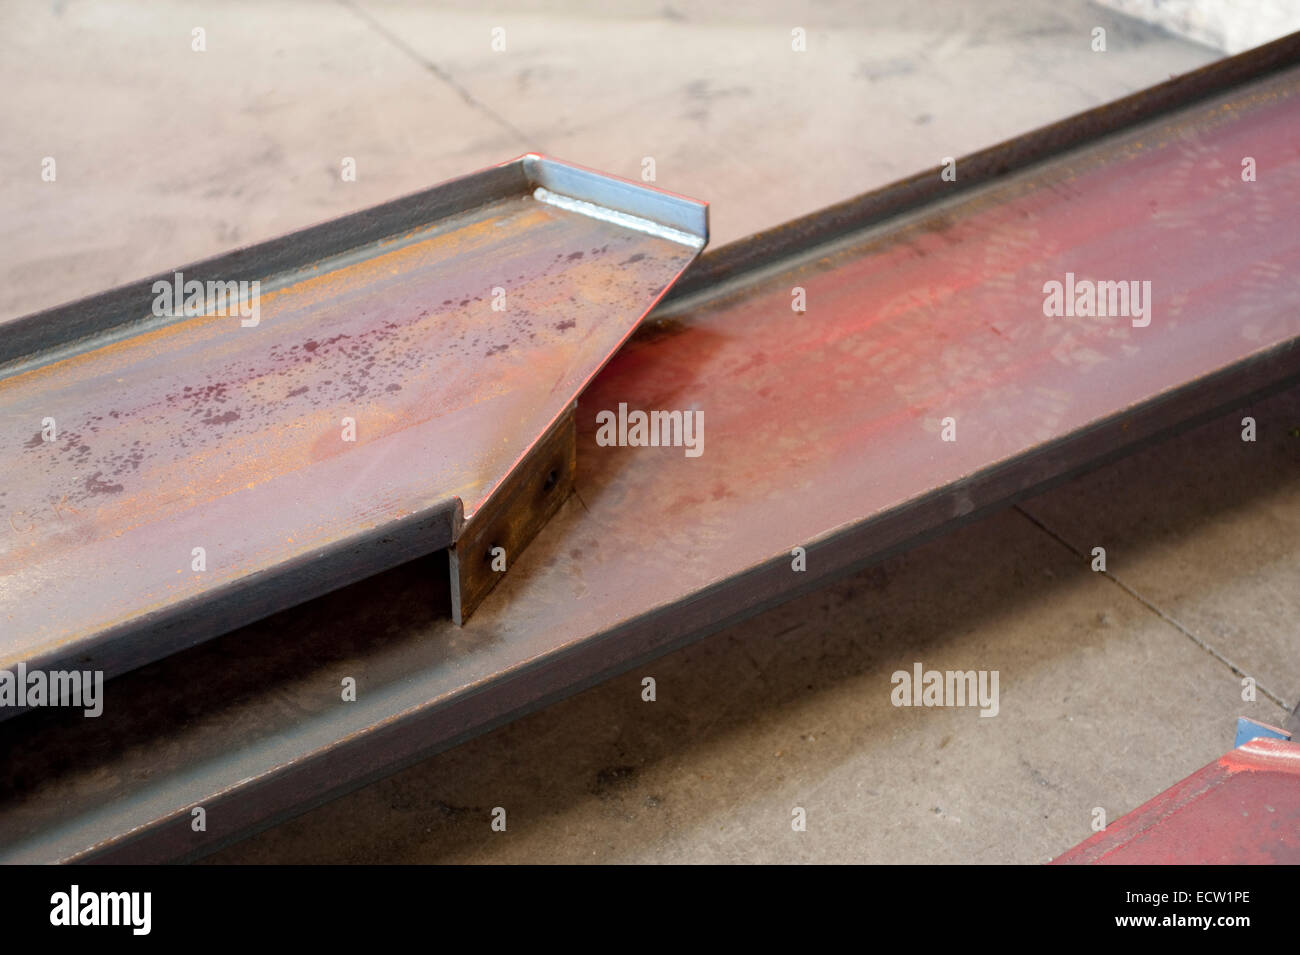 Scale in acciaio stringers a una miscellanea di fabbricazione di metalli shop. Immagini Stock